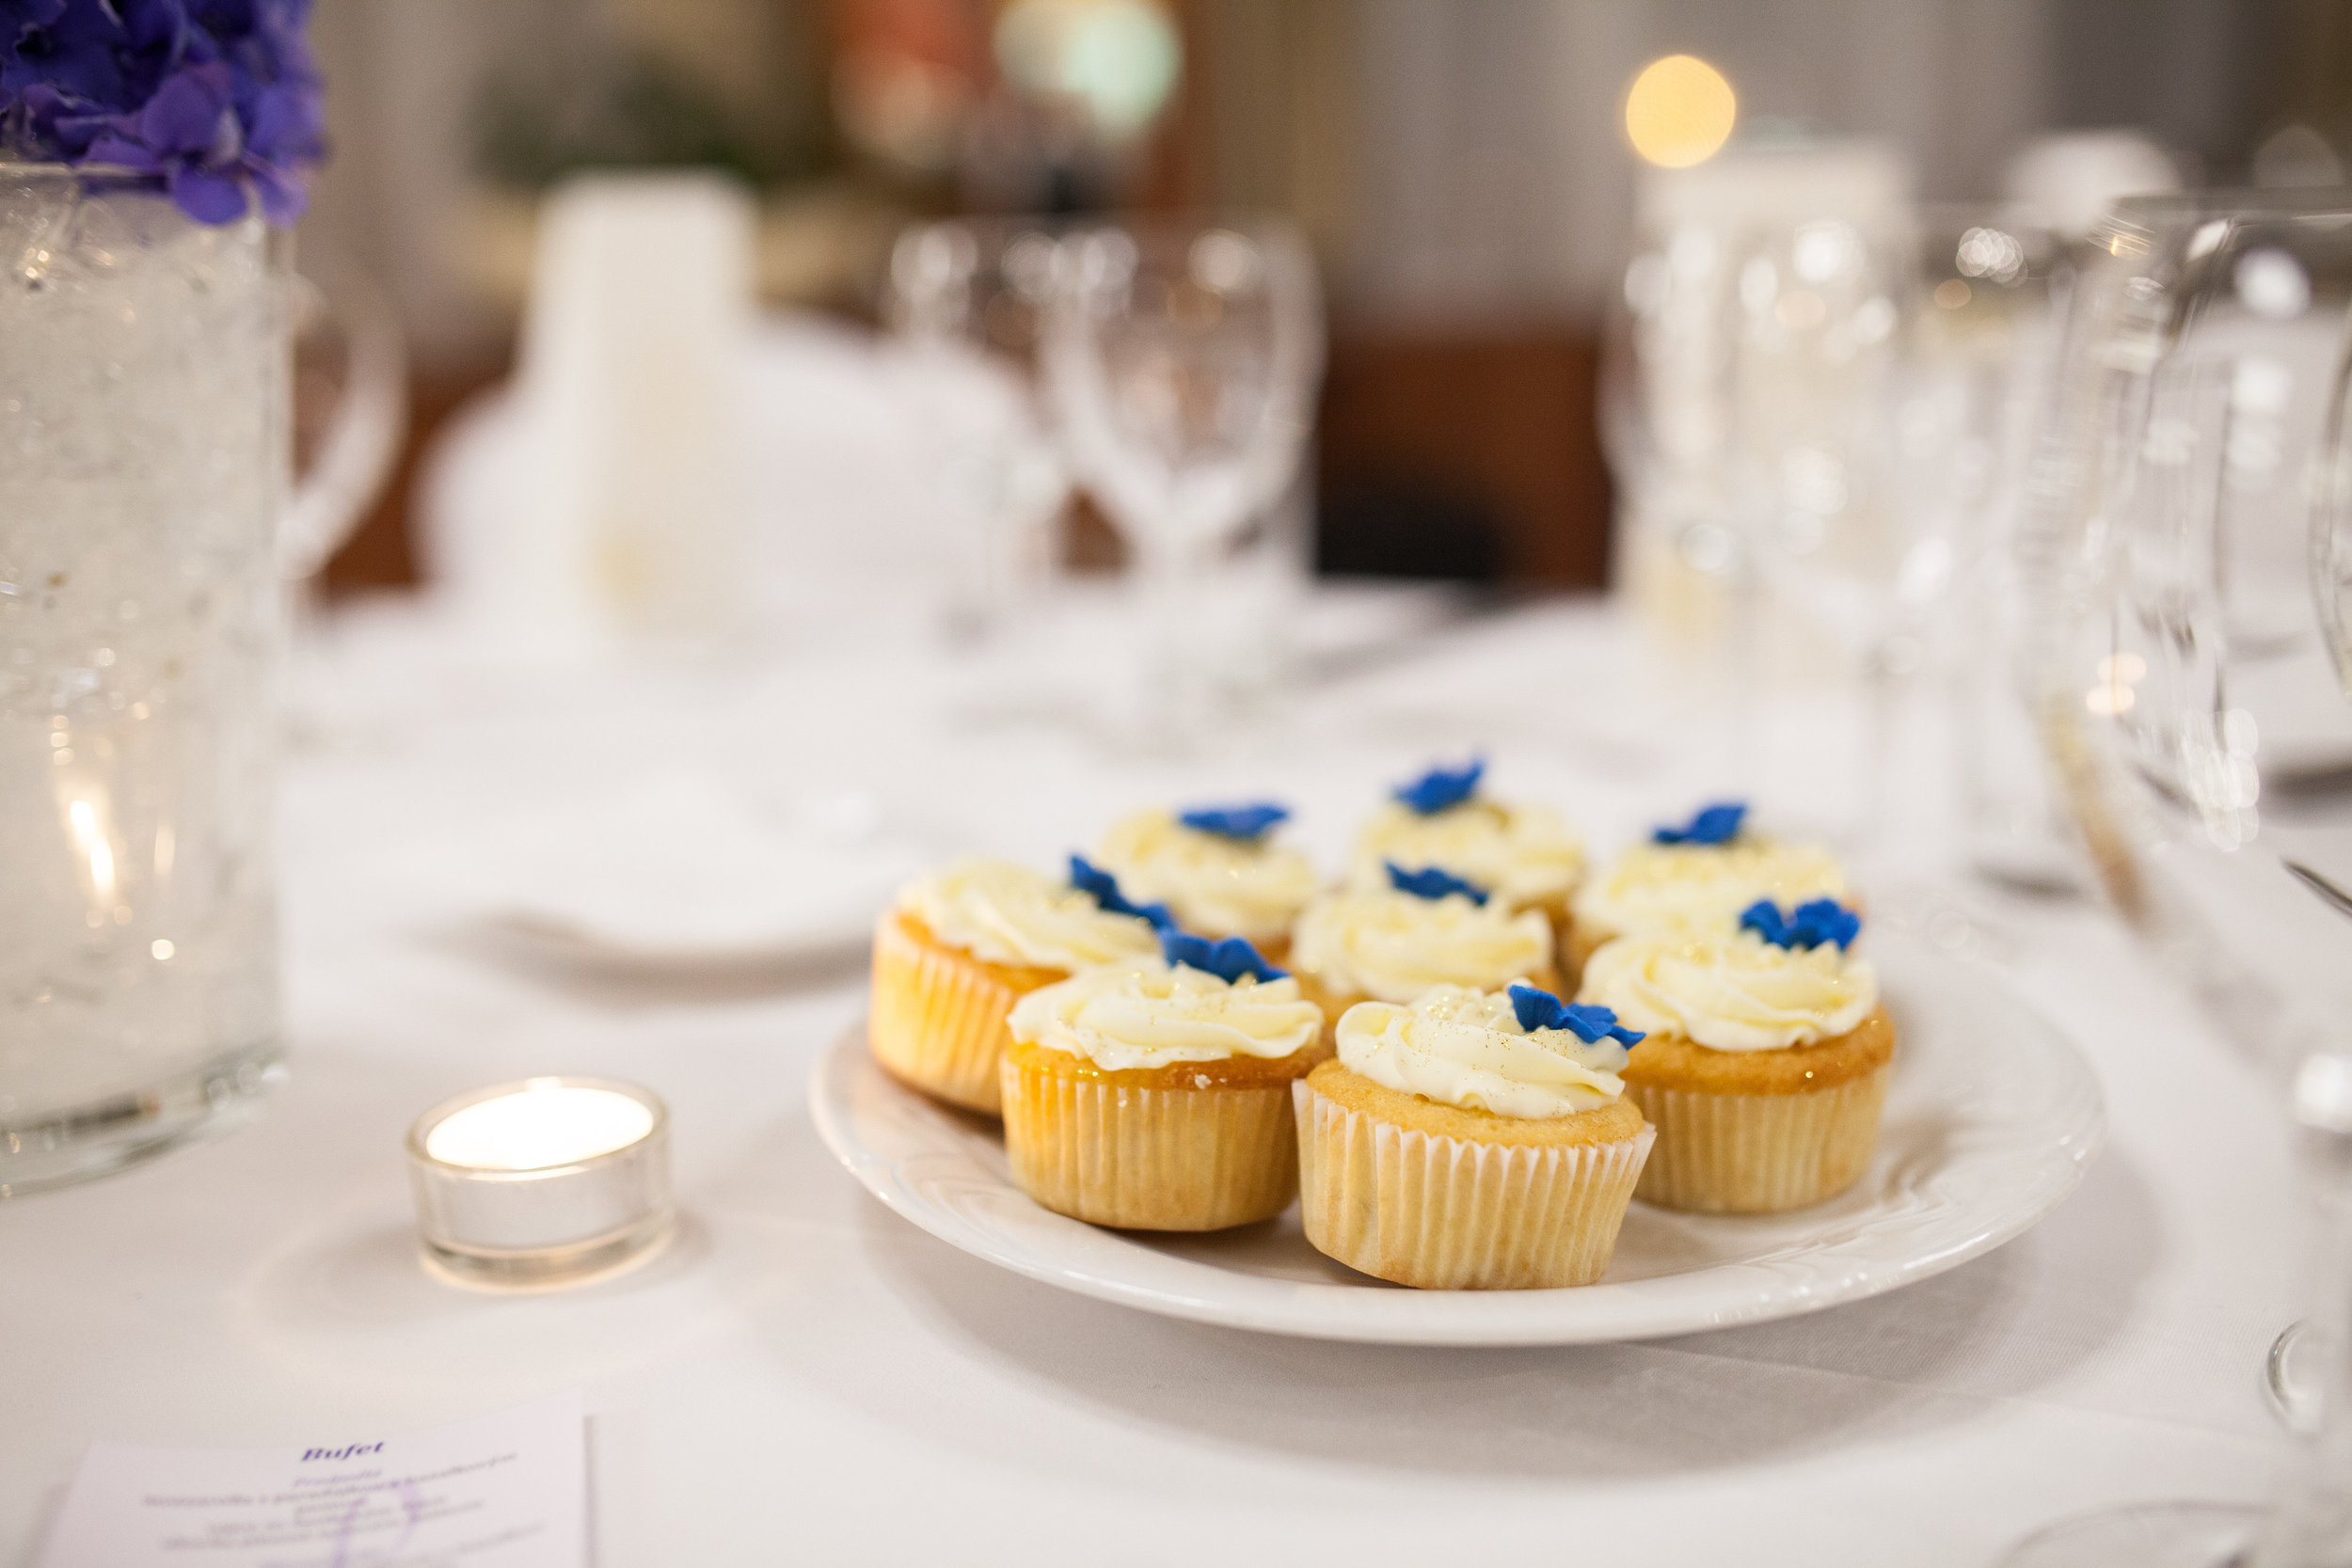 destination-wedding-photographer-slovakia-bratislava-reception-cupcake-hotel-devin-5.jpg